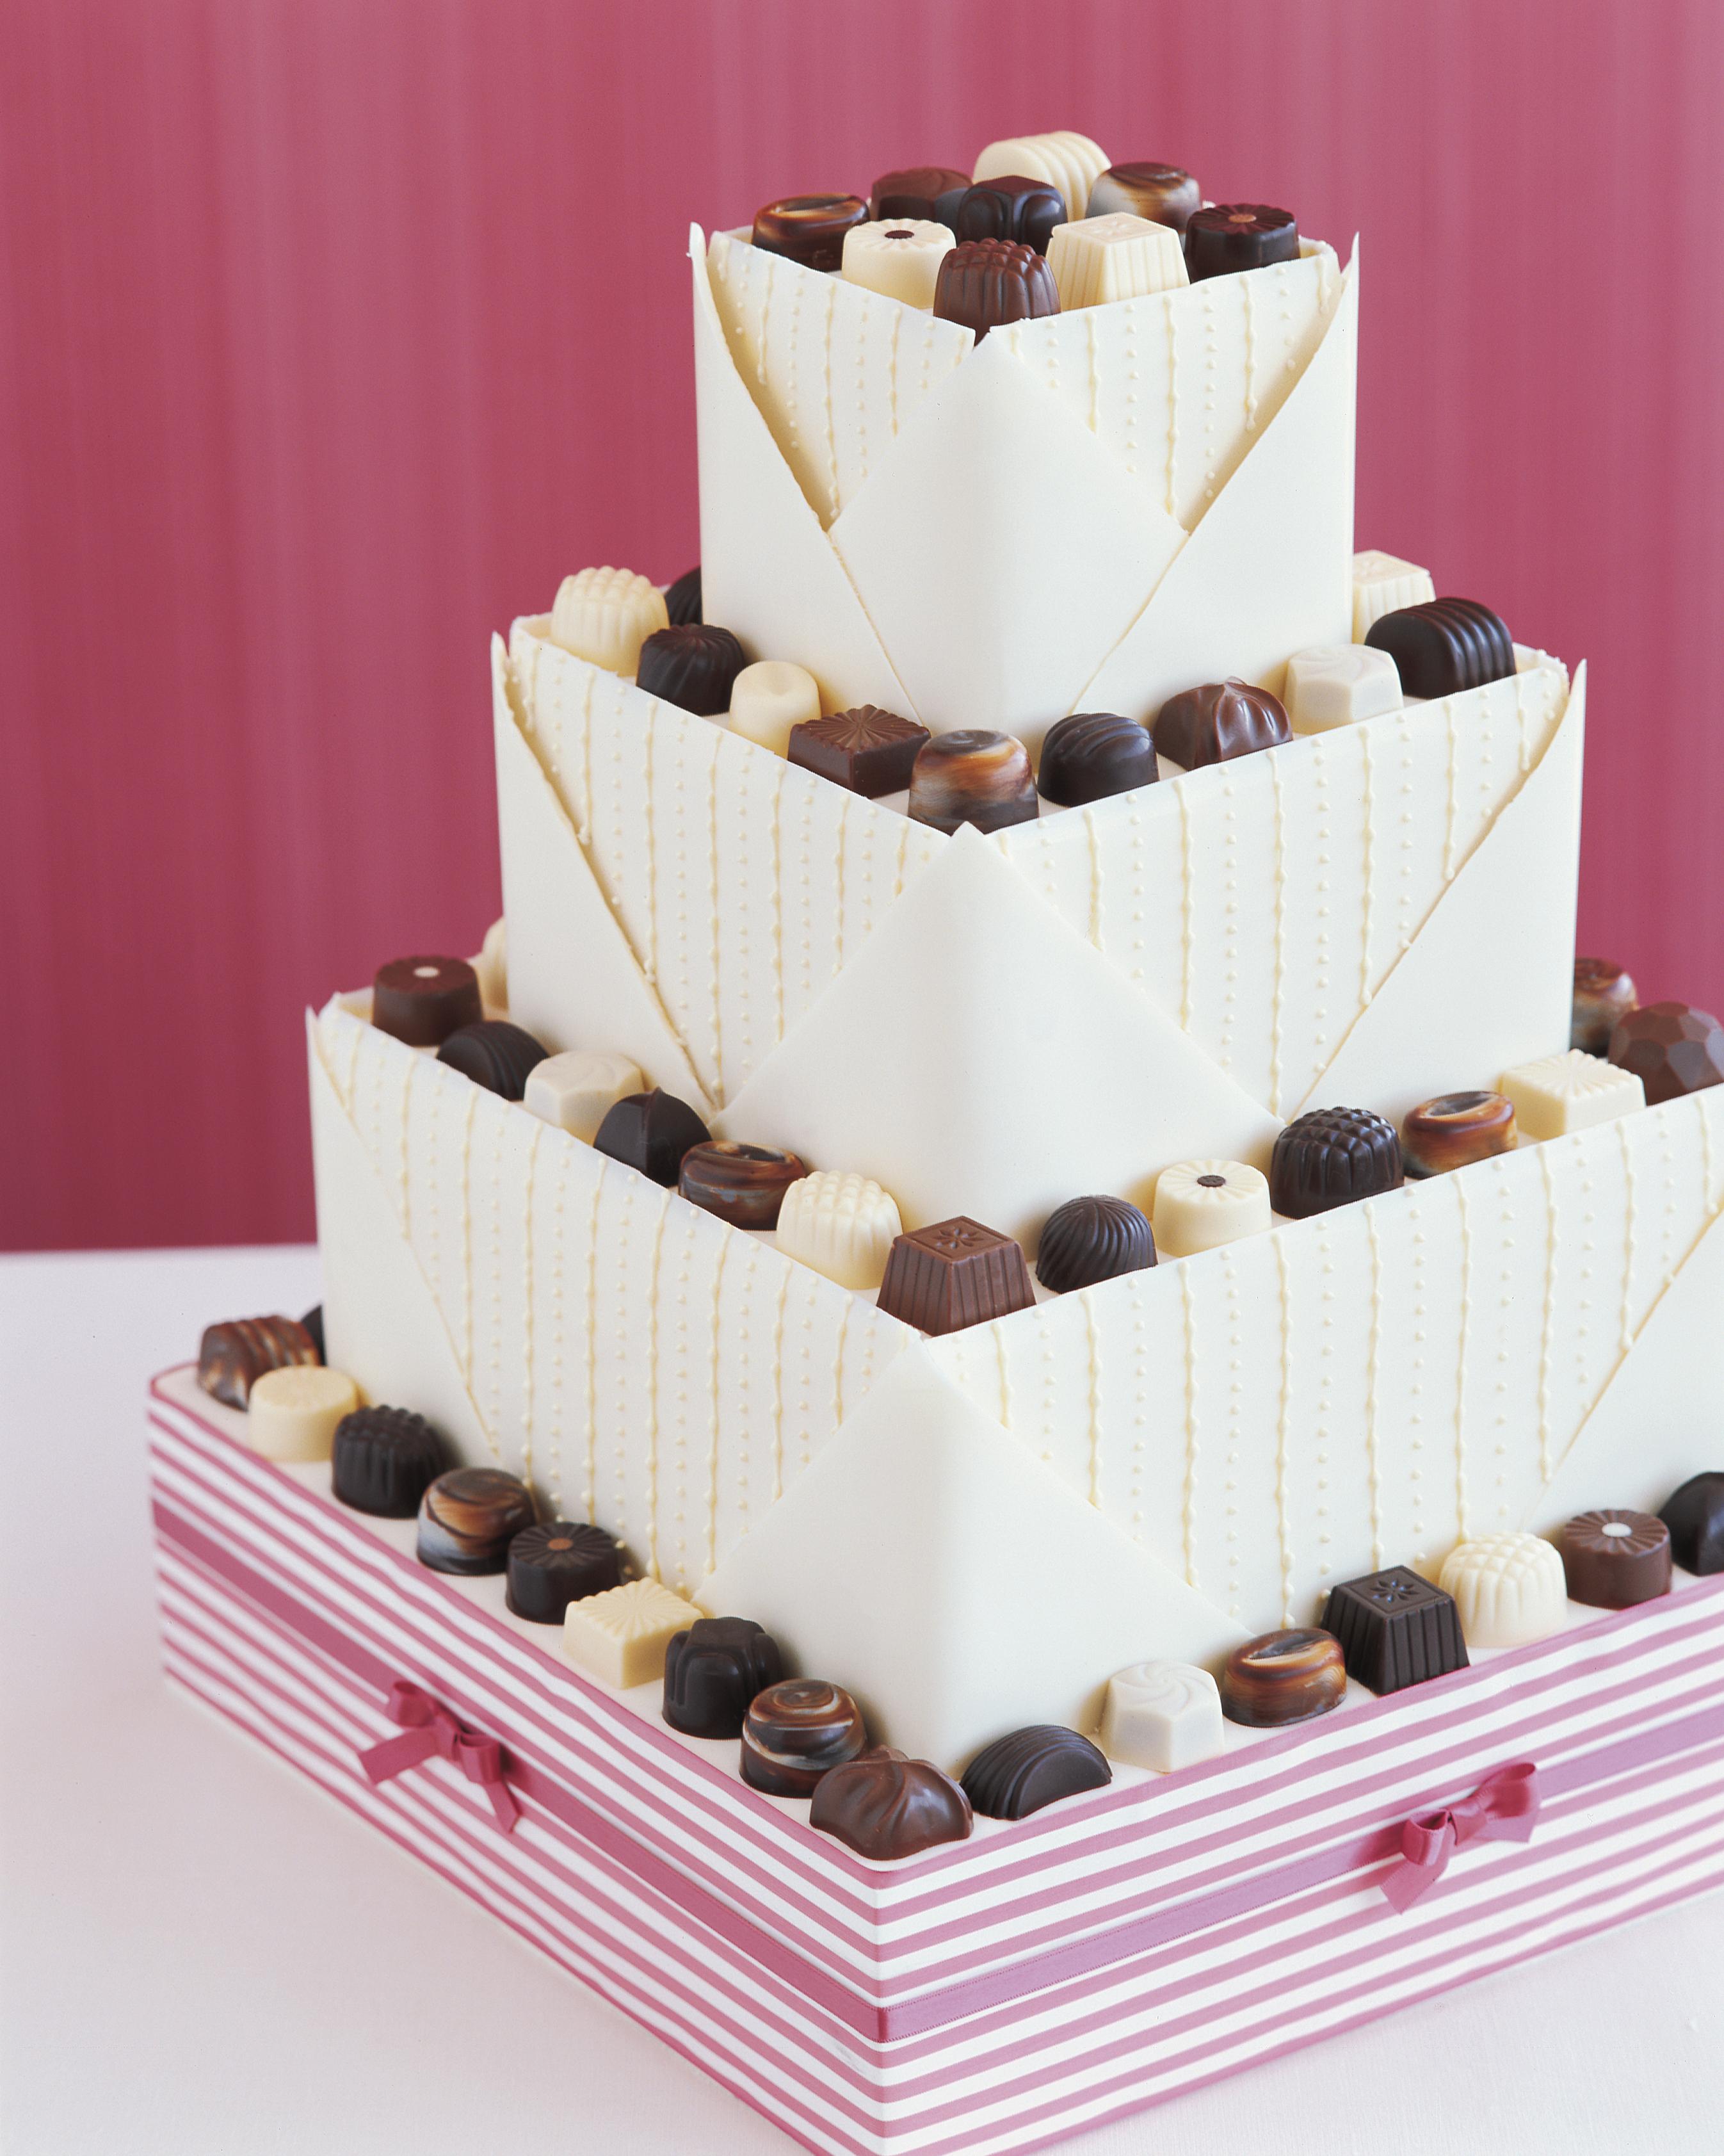 chocolate-cake-ideas-mwa101634sampler-1114.jpg